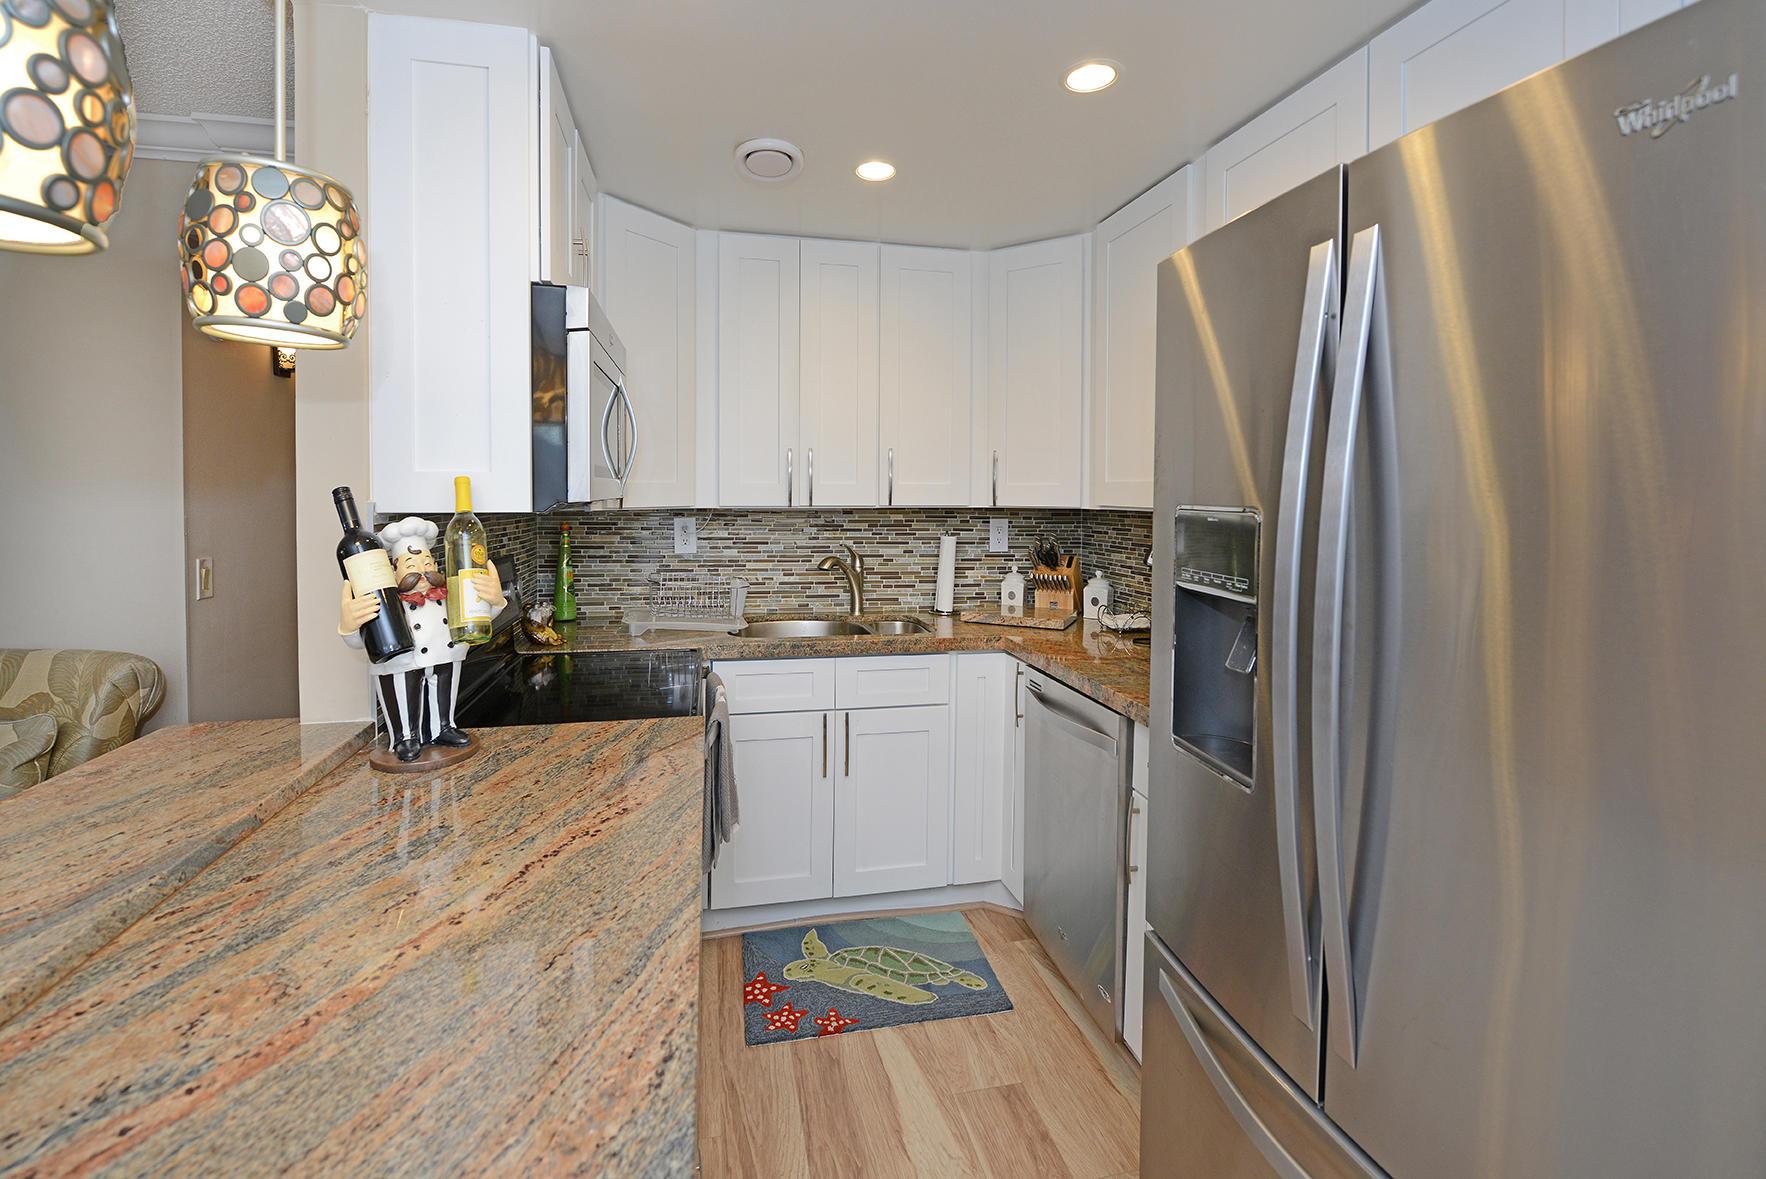 194 Piedmont, Delray Beach, Florida 33484, 2 Bedrooms Bedrooms, ,2 BathroomsBathrooms,Condo/Coop,For Sale,Kings Point,Piedmont,1,RX-10494606